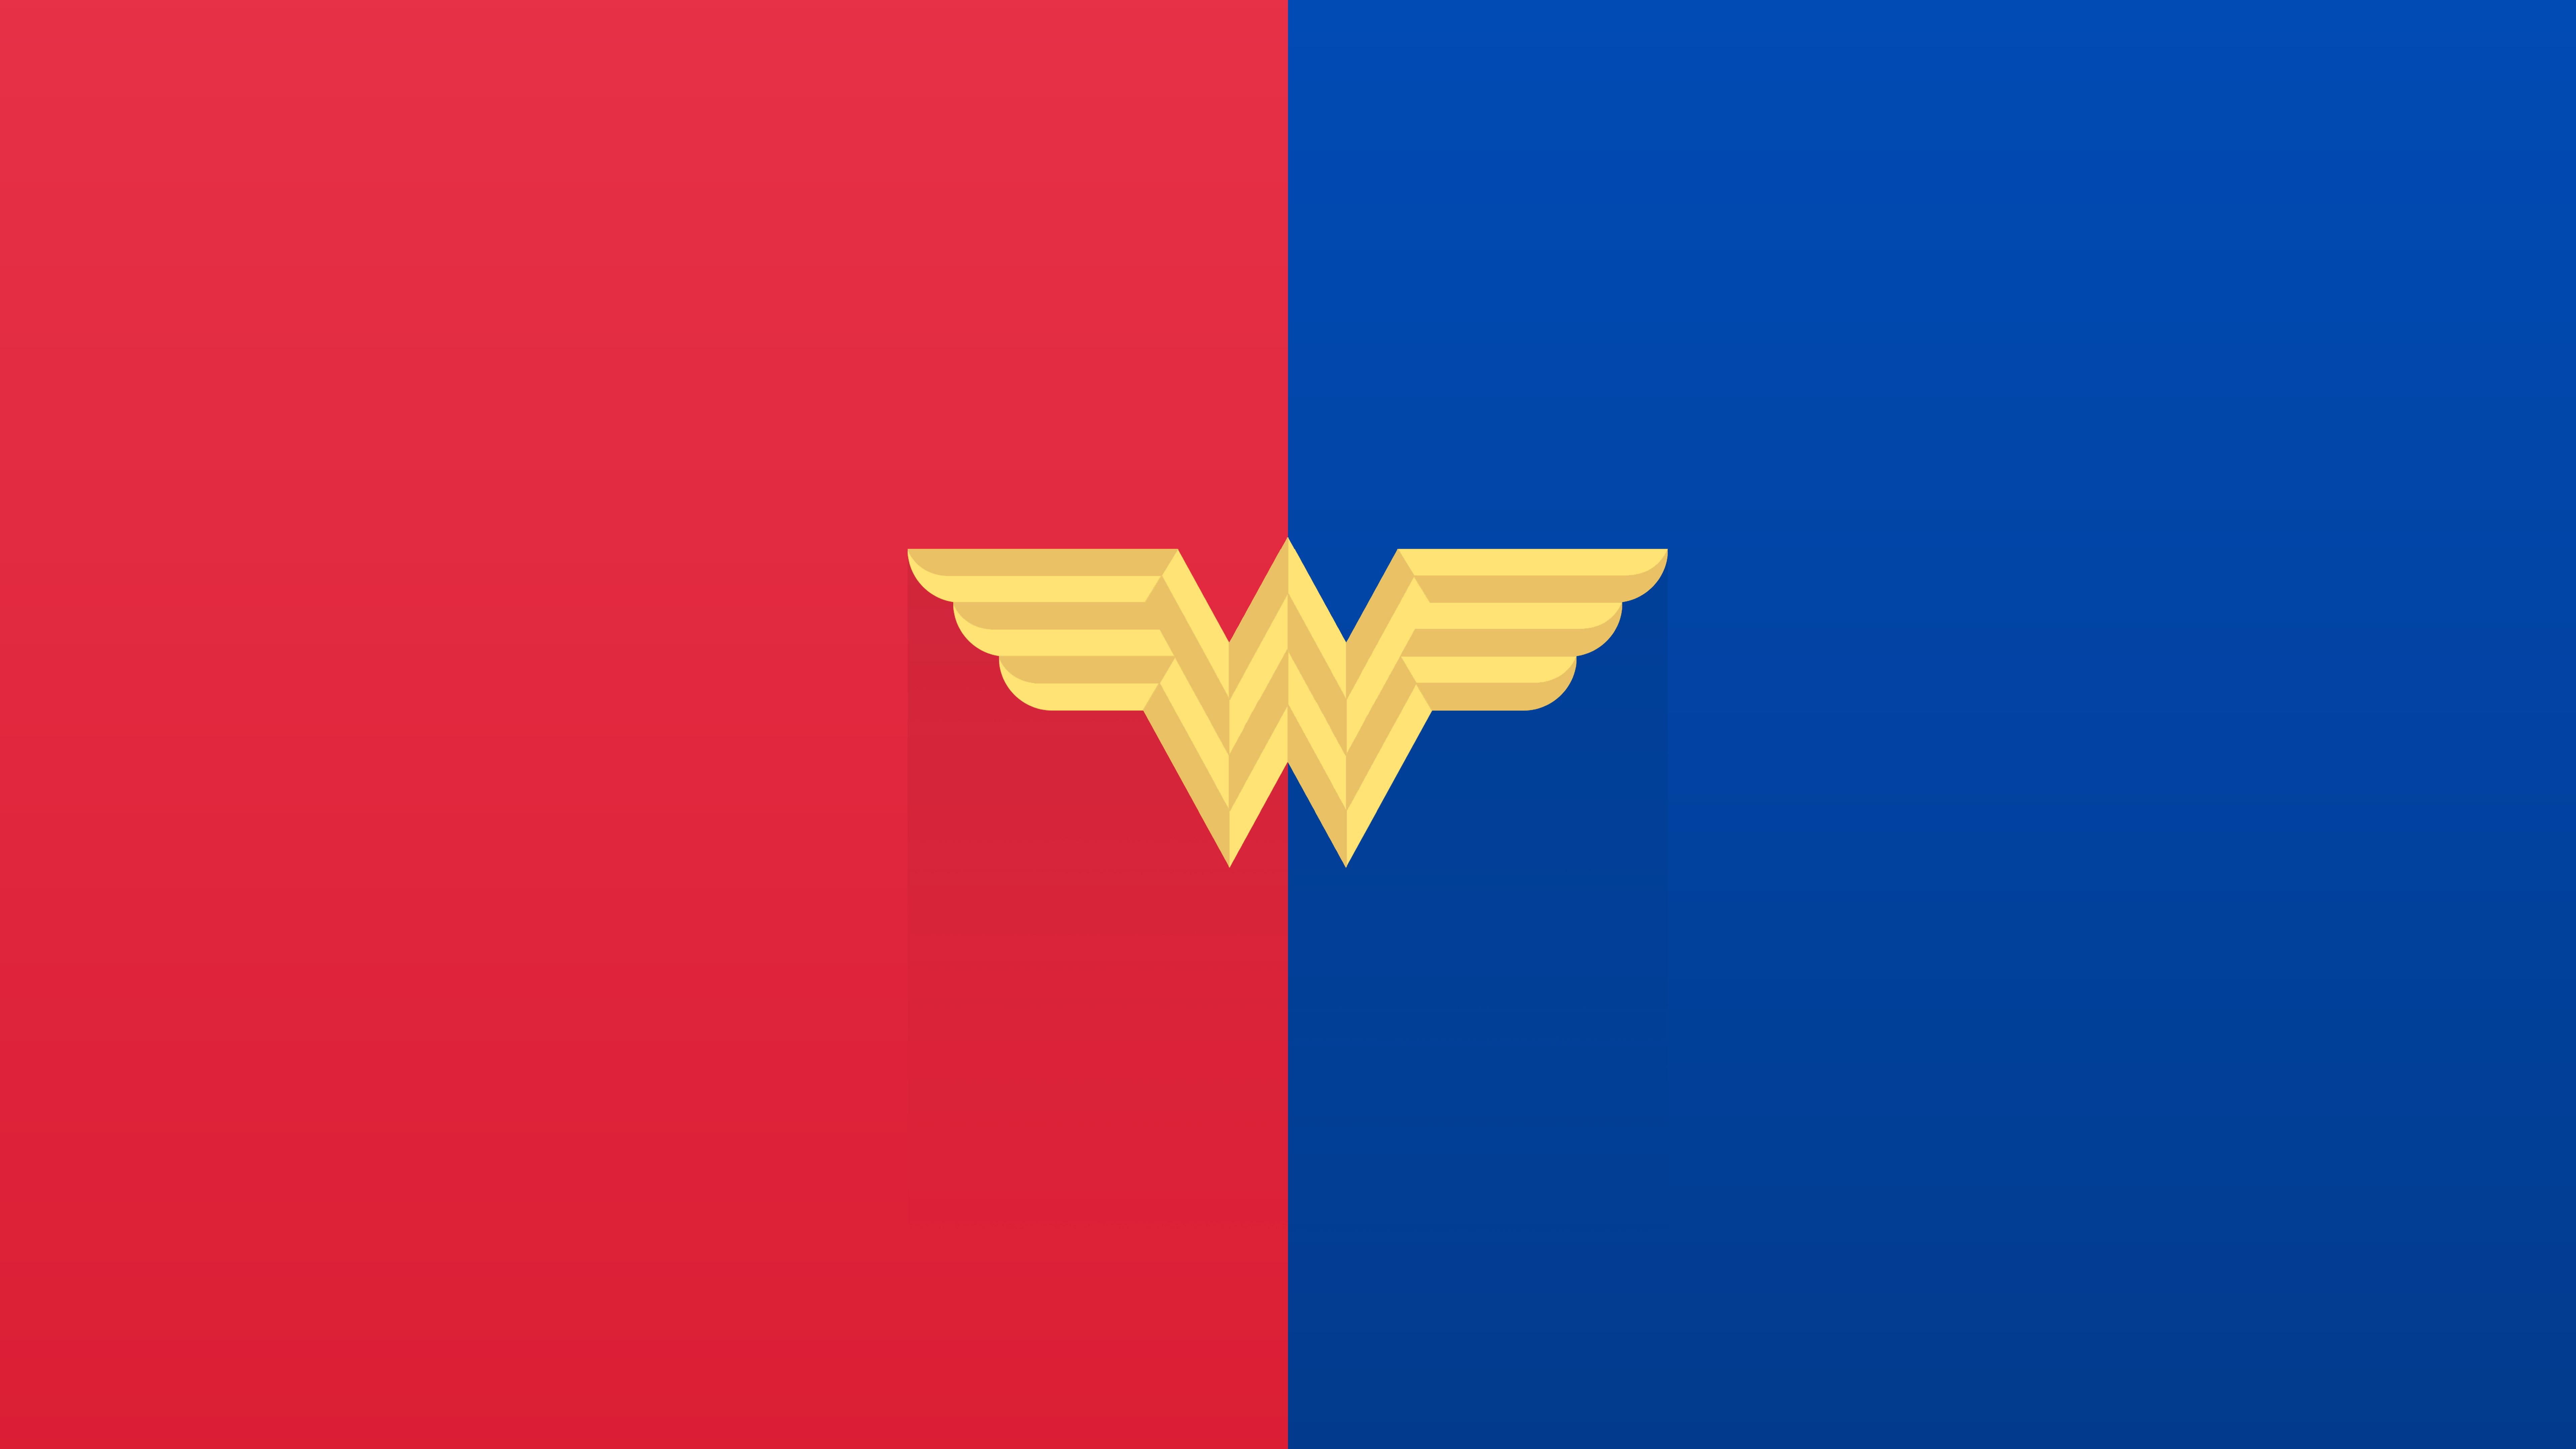 Wallpaper Wonder Woman Logo Minimalist